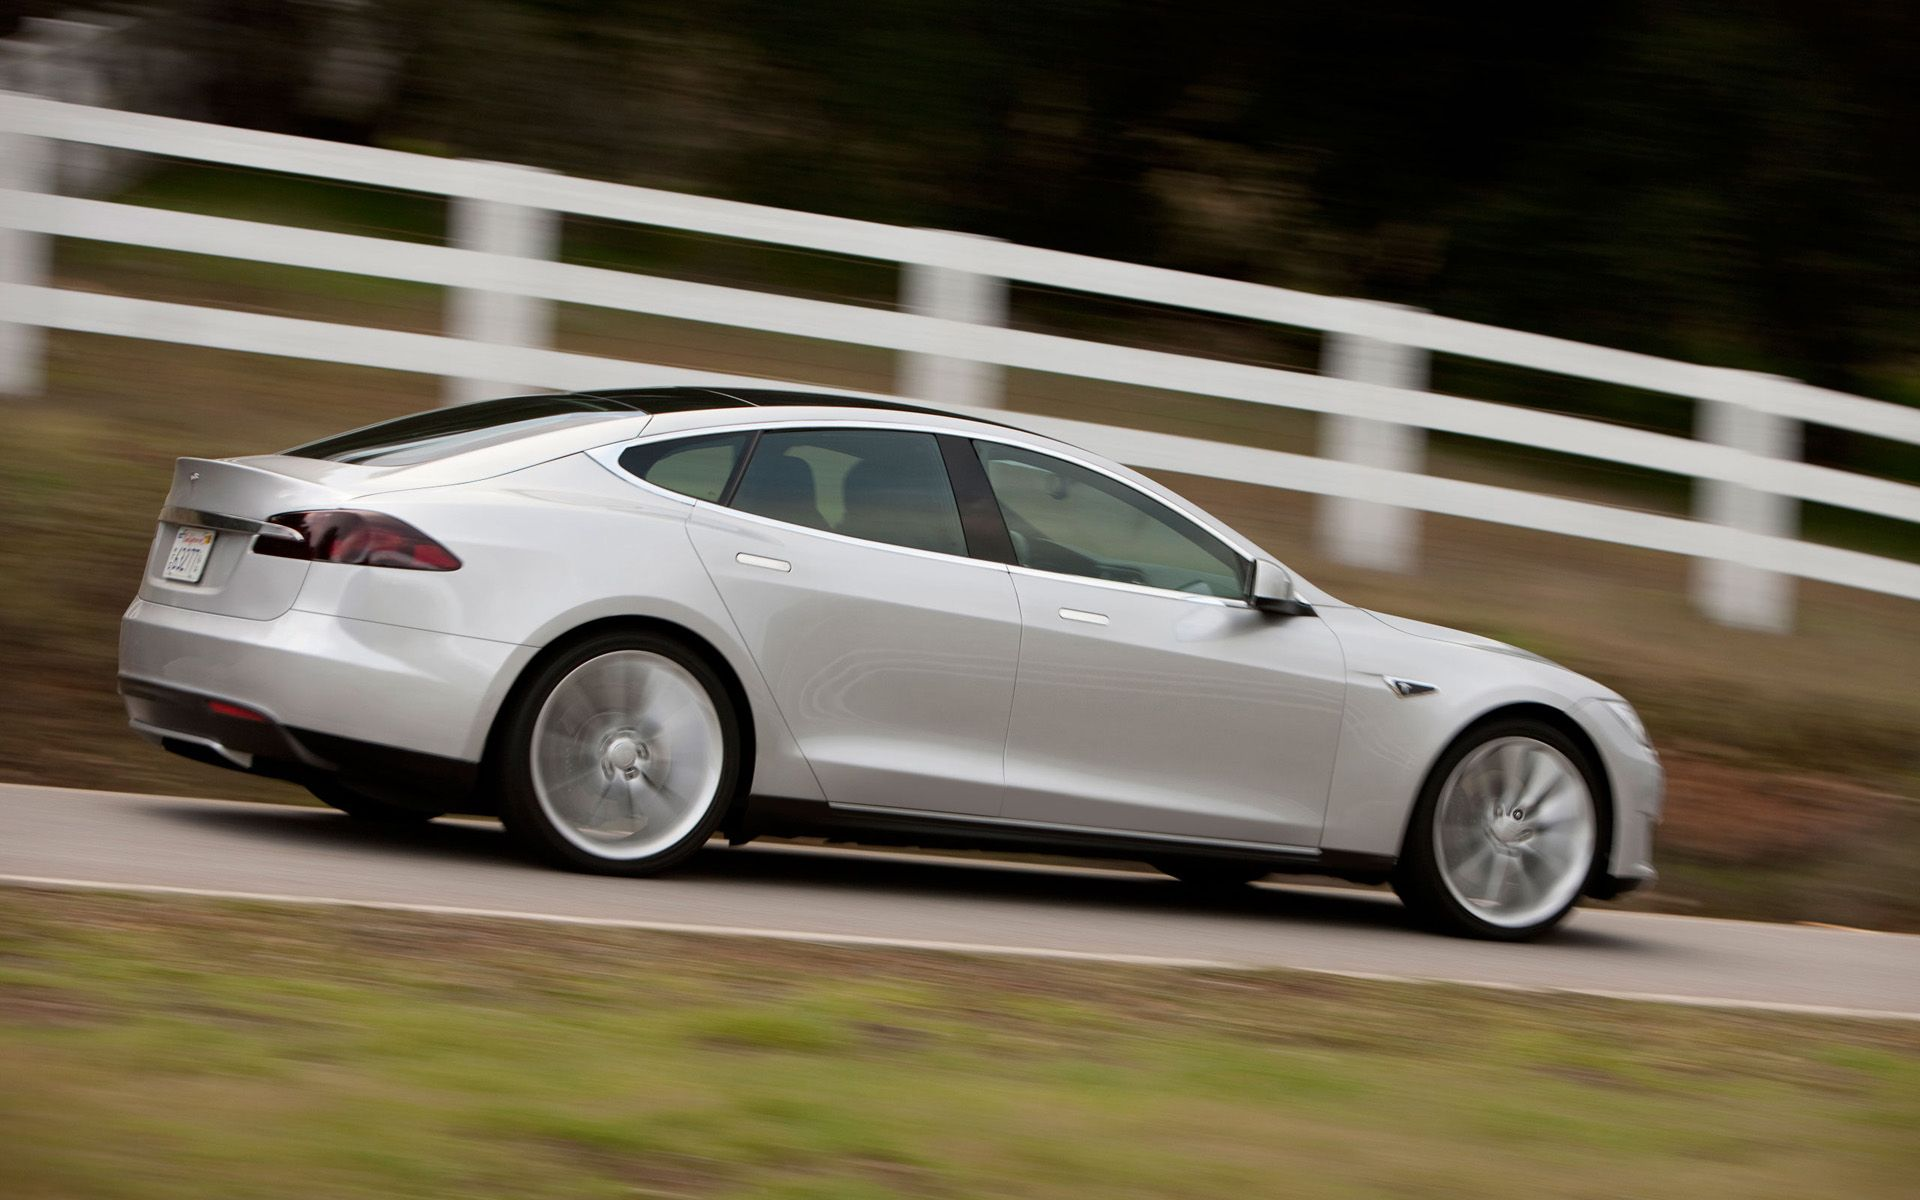 Alpha Model S Driving Tesla Motors Live HD Wallpapers - 2013 tesla model s range